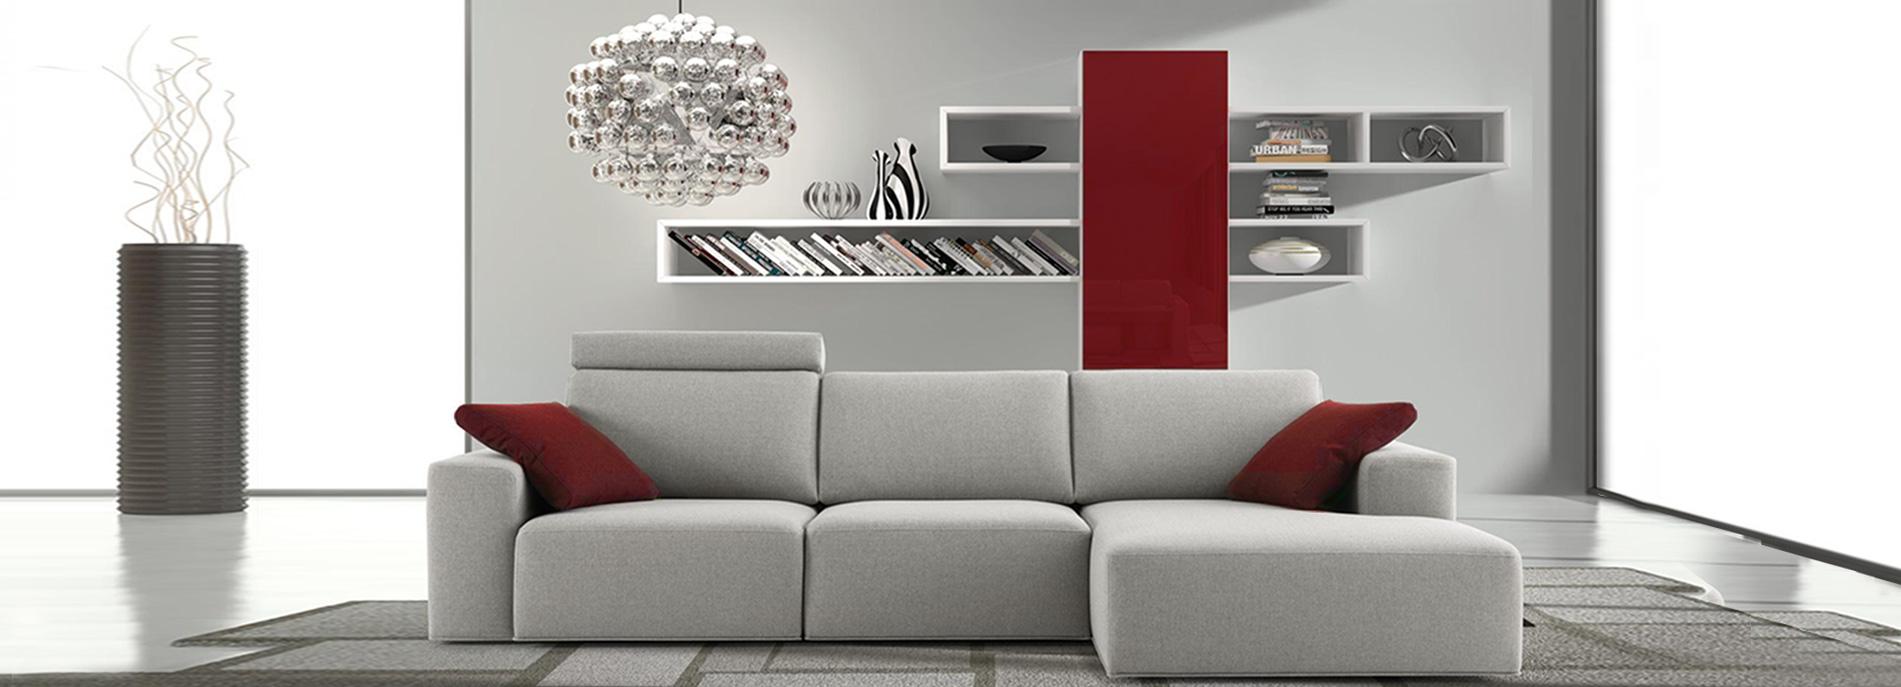 Mobili per ingresso moderni on line design casa creativa - Mobili ingresso roma ...